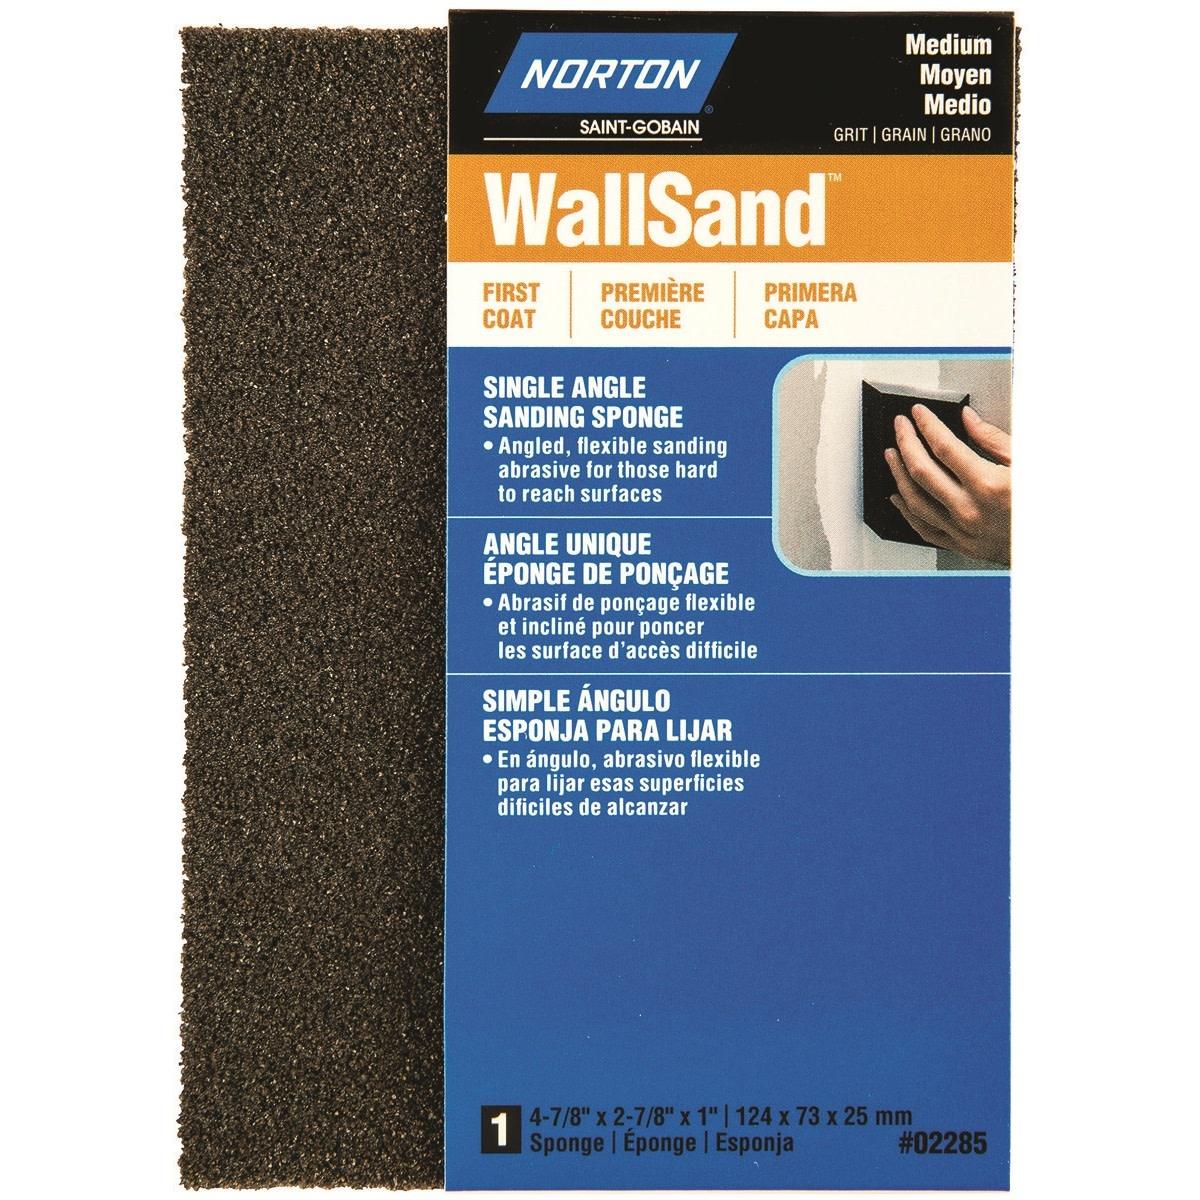 Wallsand Angle Sponge Medium